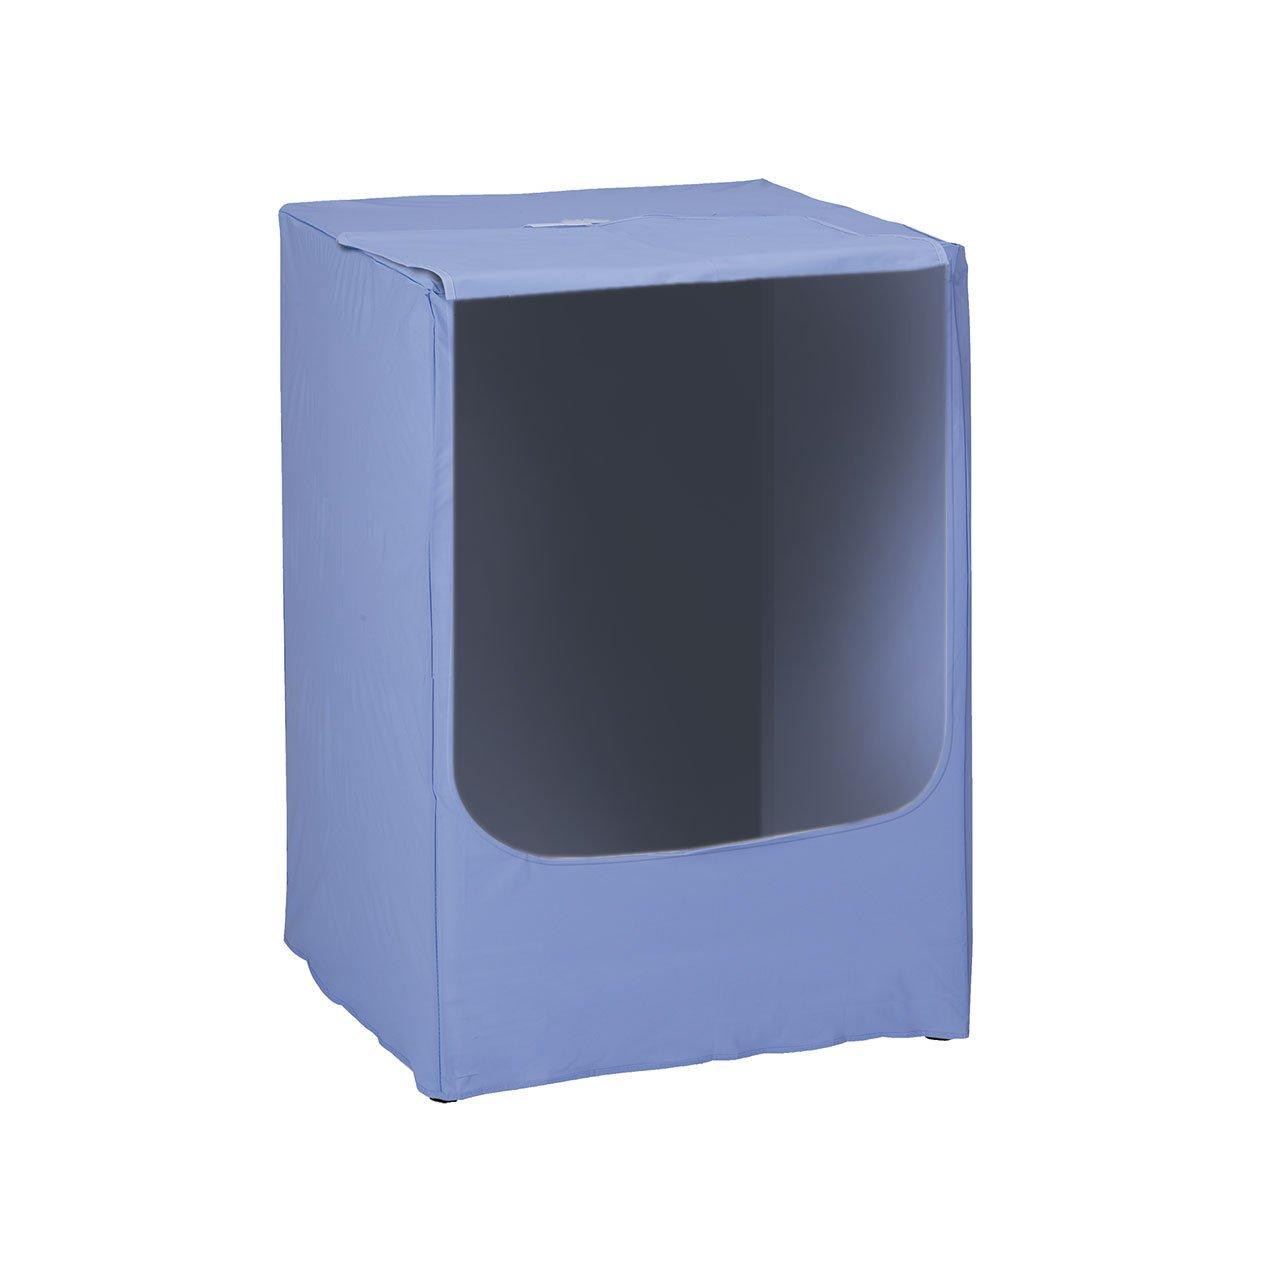 Adesivo Para Geladeira Inteira Mercado Livre ~ Muebles Para Lavadoras Armario De Lavandera Easy Roll Persiana Xx B Muebles Para Lavadoras